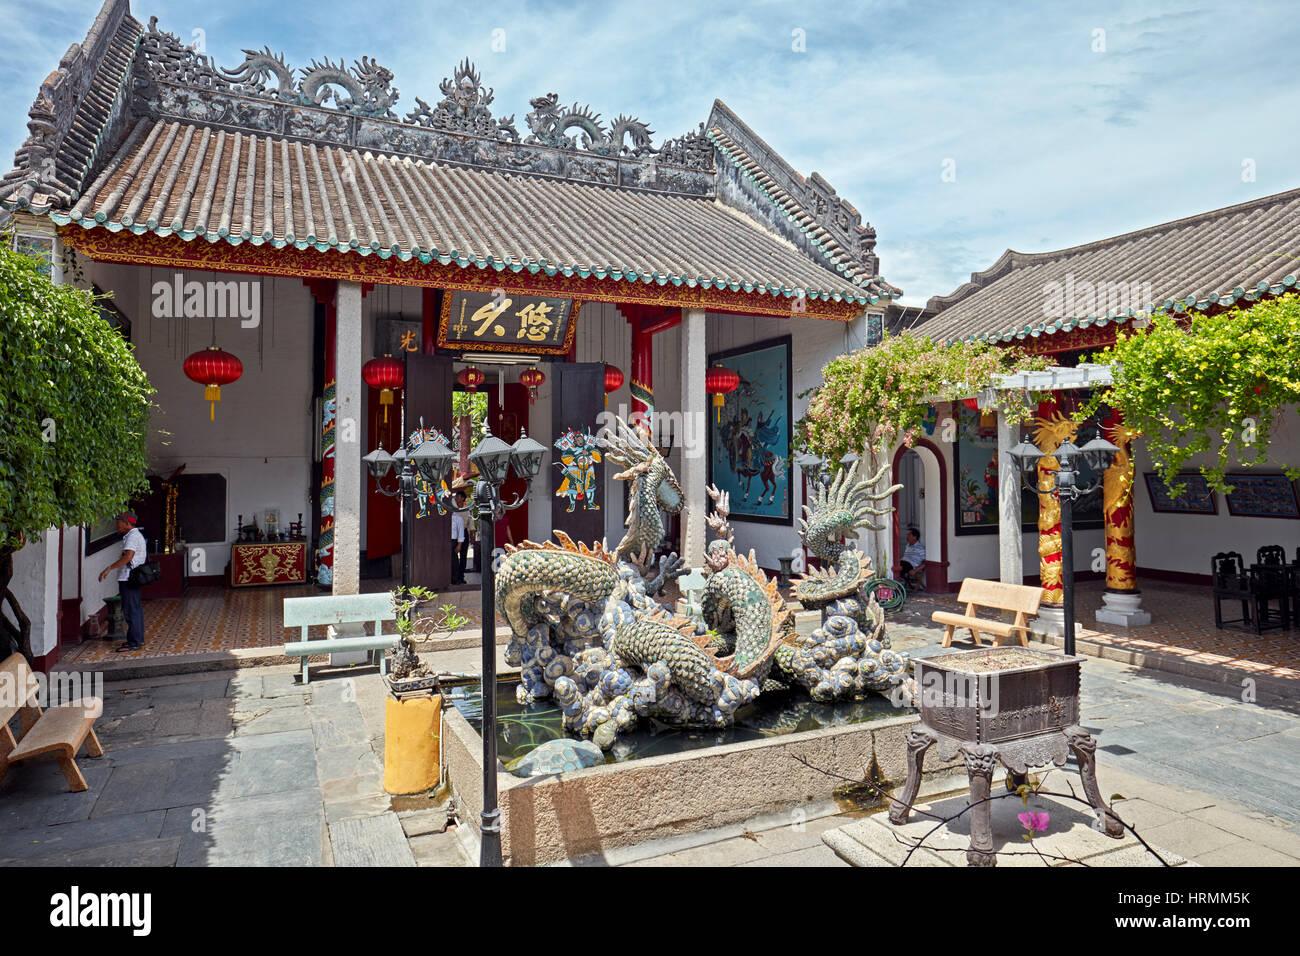 Cantonese (Quang Trieu) Assembly Hall. Hoi An Ancient Town, Quang Nam Province, Vietnam. - Stock Image